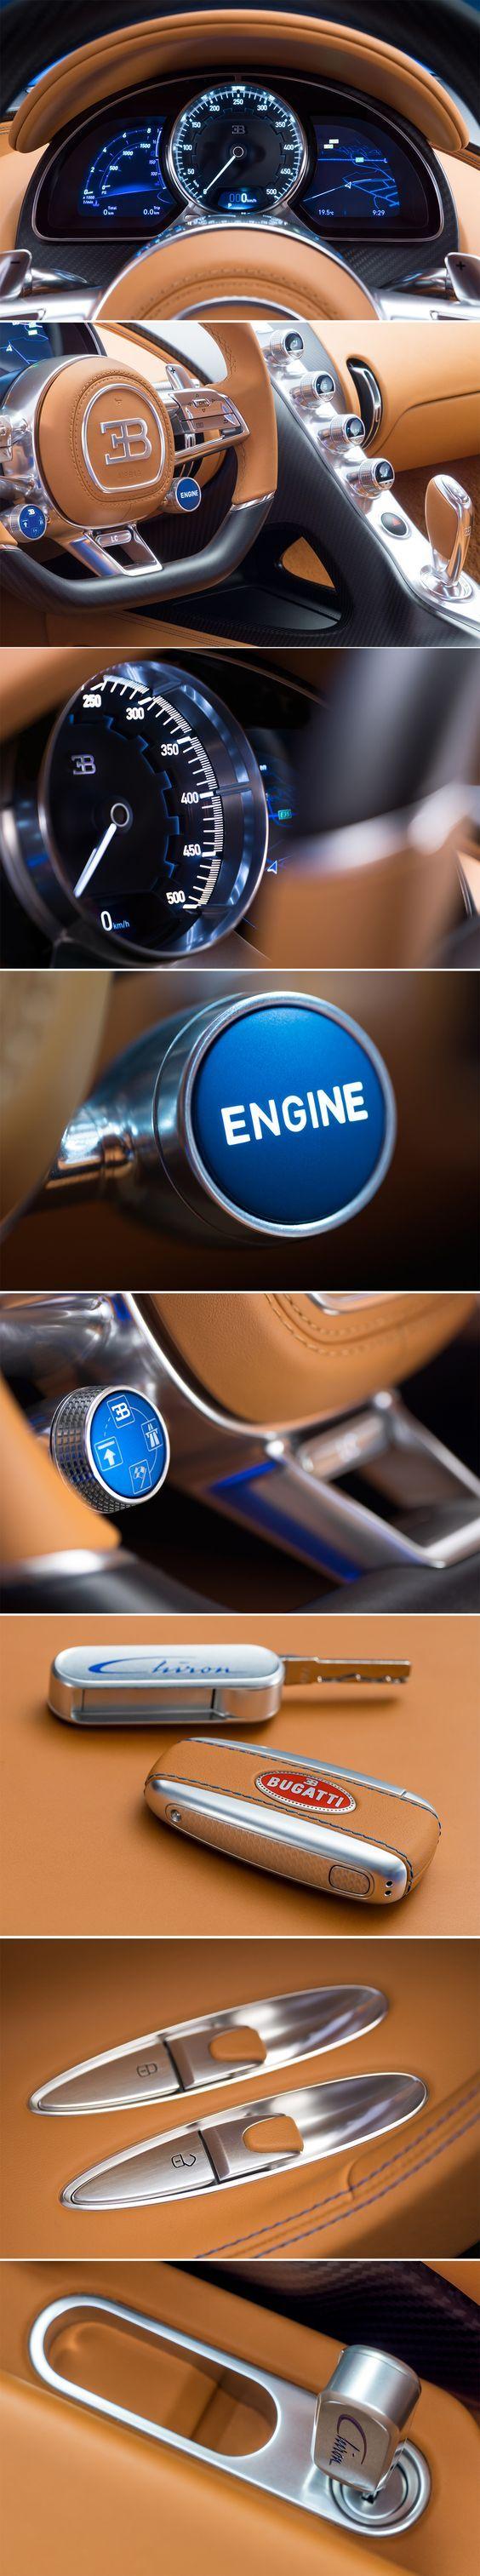 5 little known facts about the bugatti chiron luxury car lifestyle autos fahrzeuge automobil. Black Bedroom Furniture Sets. Home Design Ideas